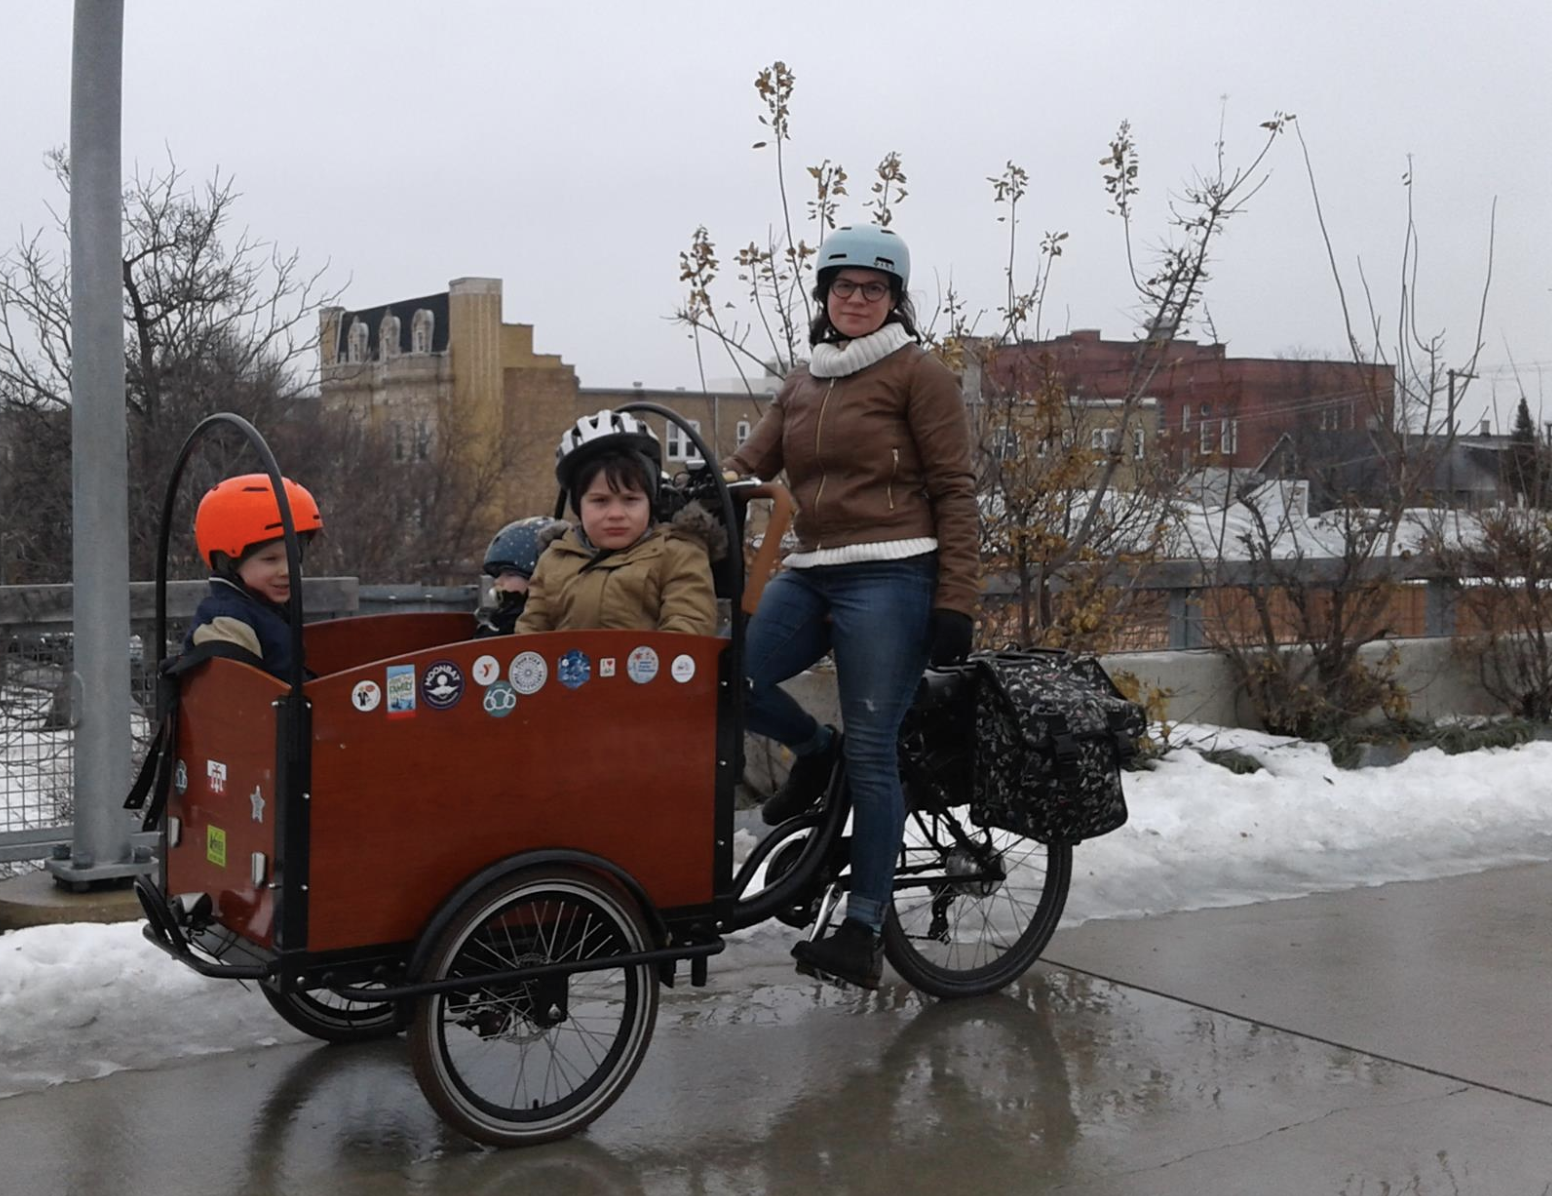 Cargo-Bike-Trike-Winter-Bunch-Bikes